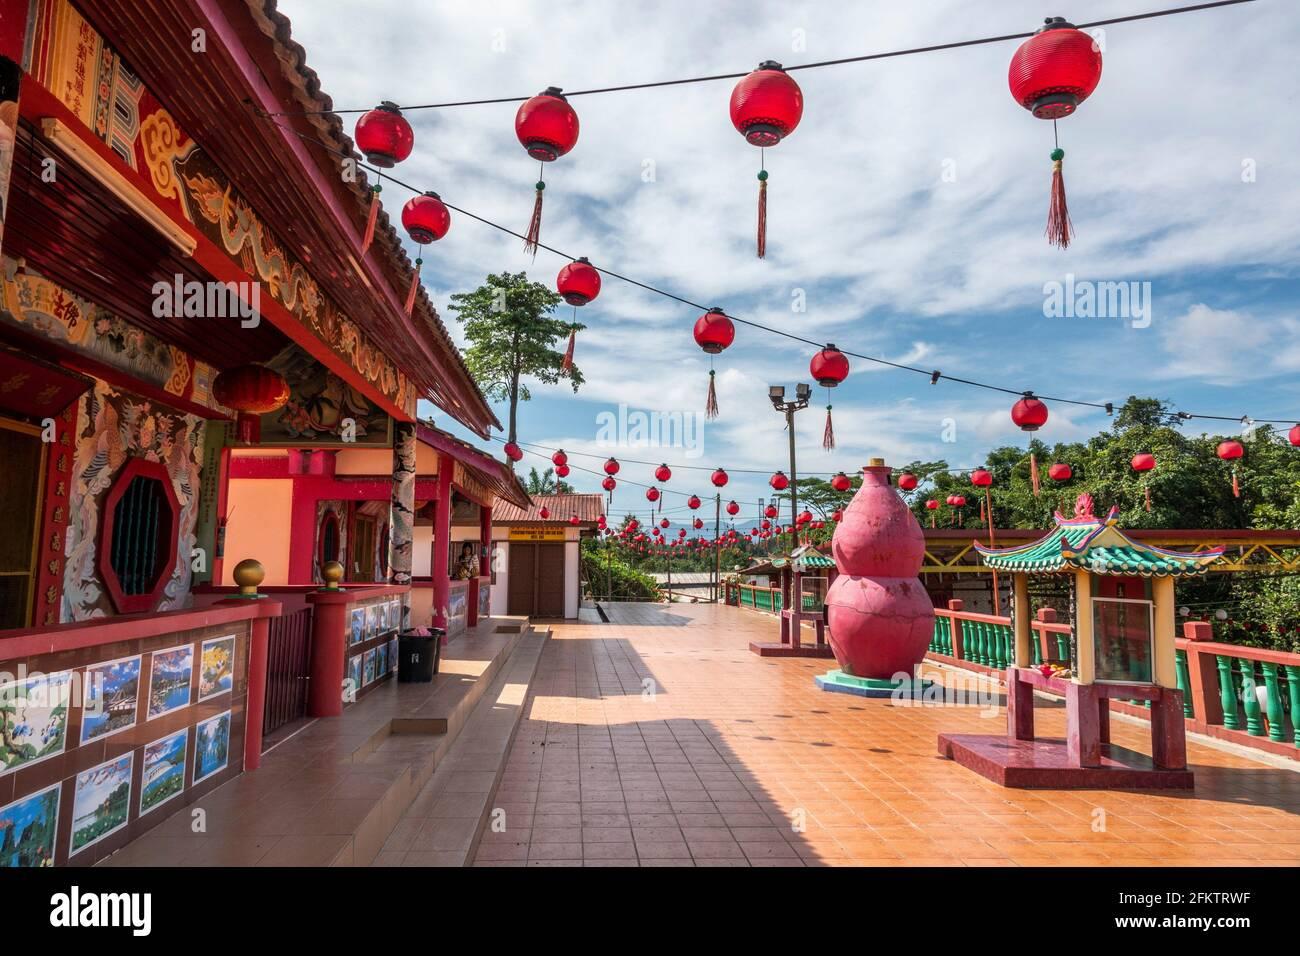 Temple chinois, Kampung Musi, Bau, Sarawak, Malaisie orientale Banque D'Images